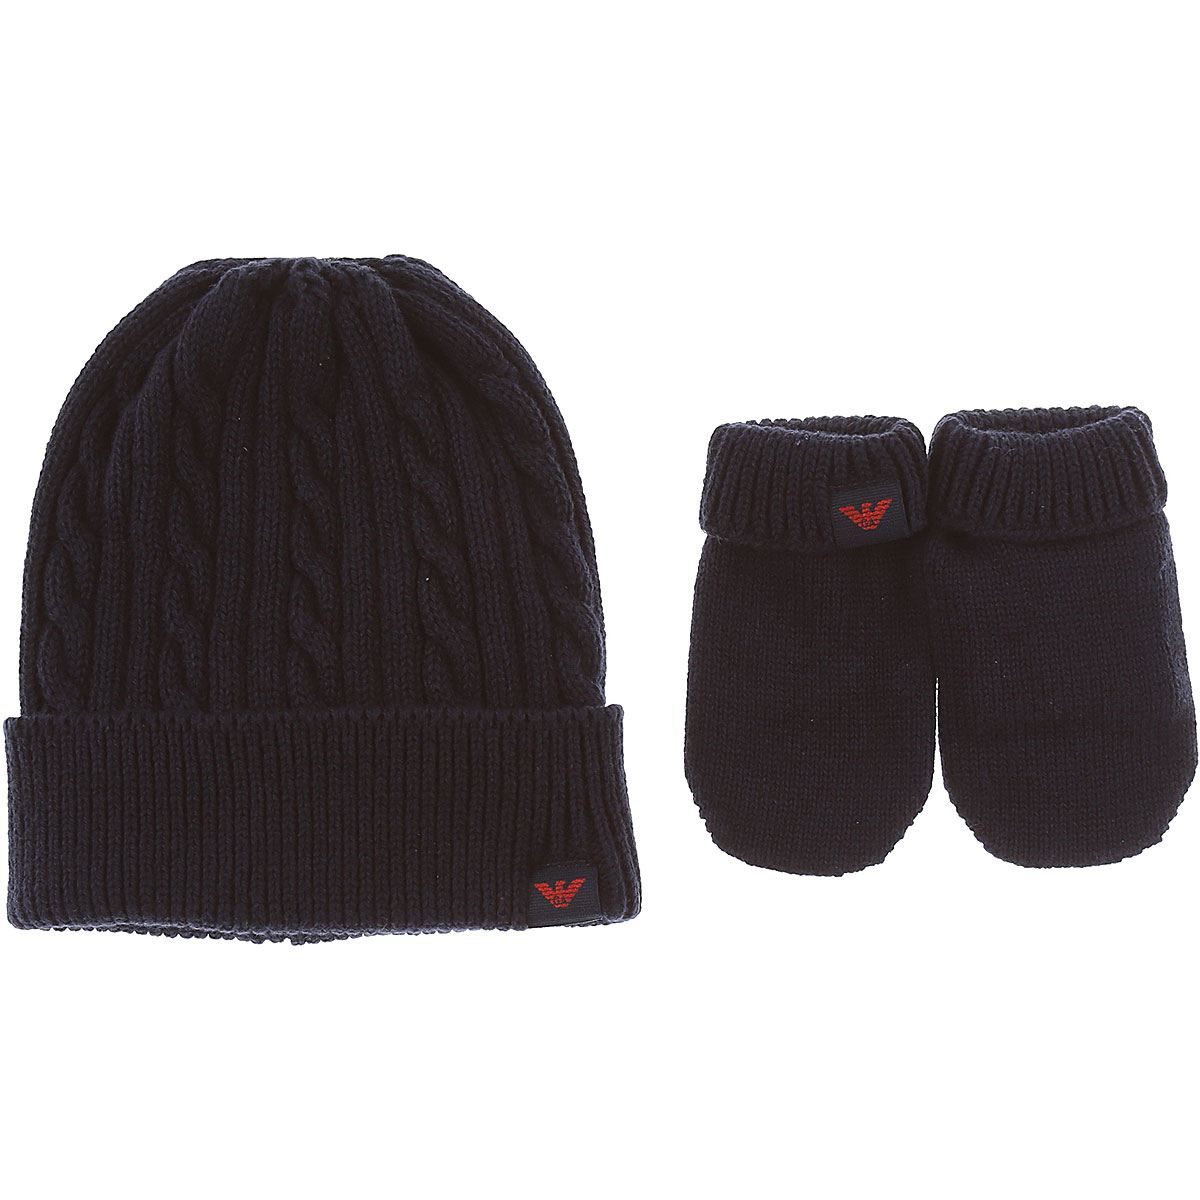 2c10bd29a17 Baby Boy Clothing Emporio Armani